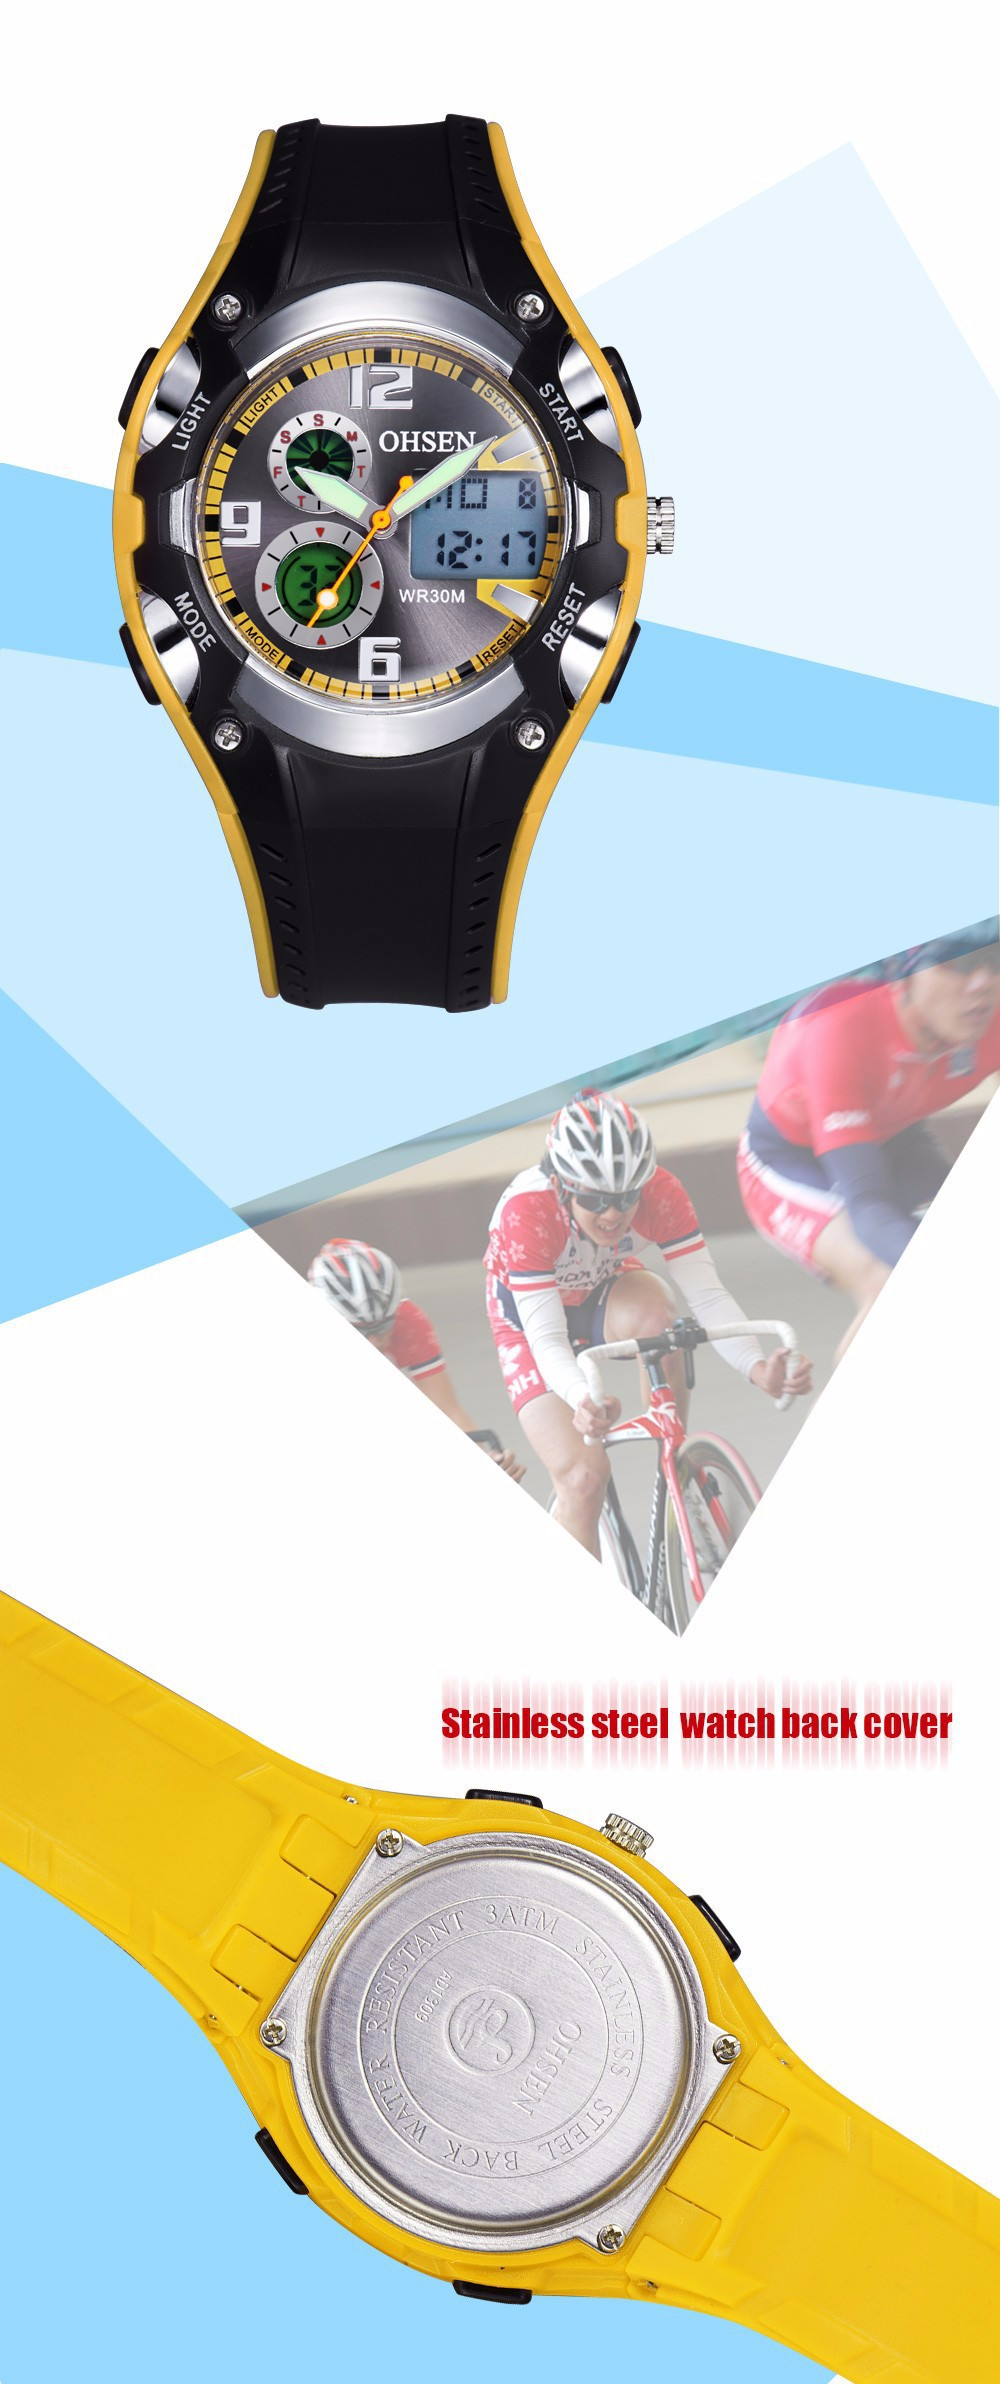 Original Ohsen Brand Fashion Sports Men's Watches 30M Waterproof Rubber Black Rubber Band Digital Sport Wristwatch for Men Gift (20)